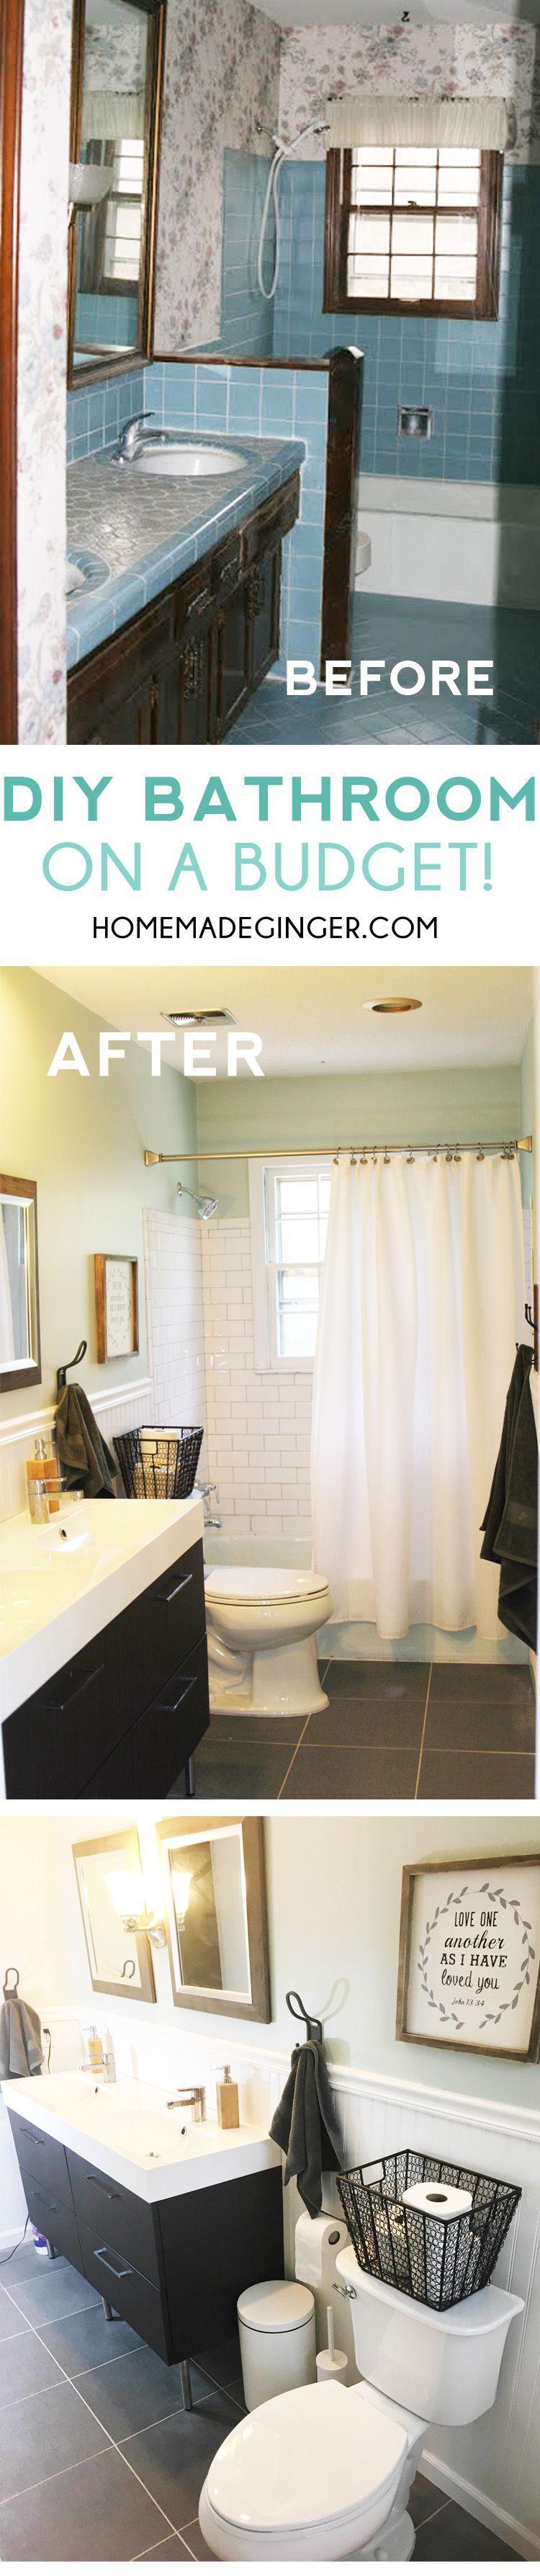 DIY Bathroom On A Budget | Budgeting, Living rooms and Bathroom tiling